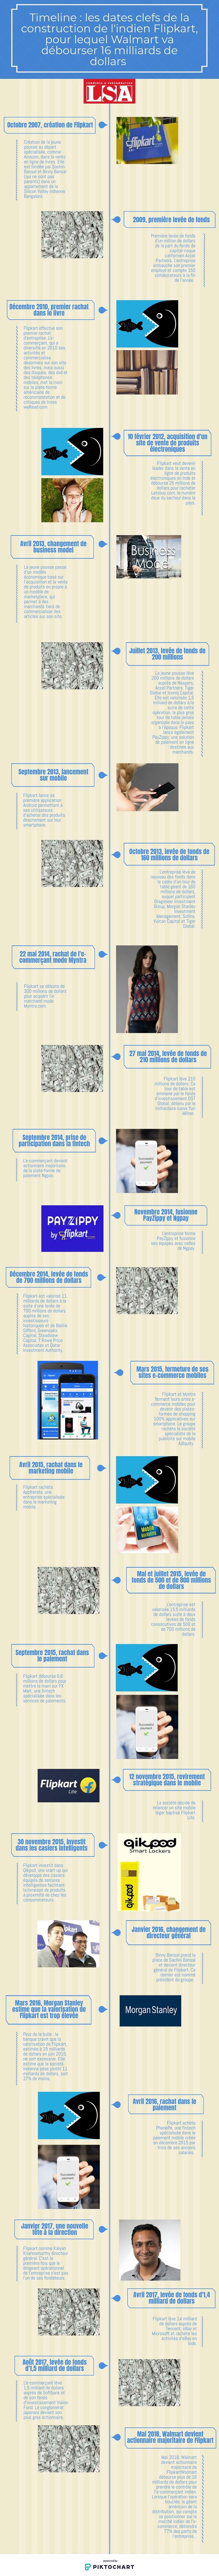 infographie flipkart